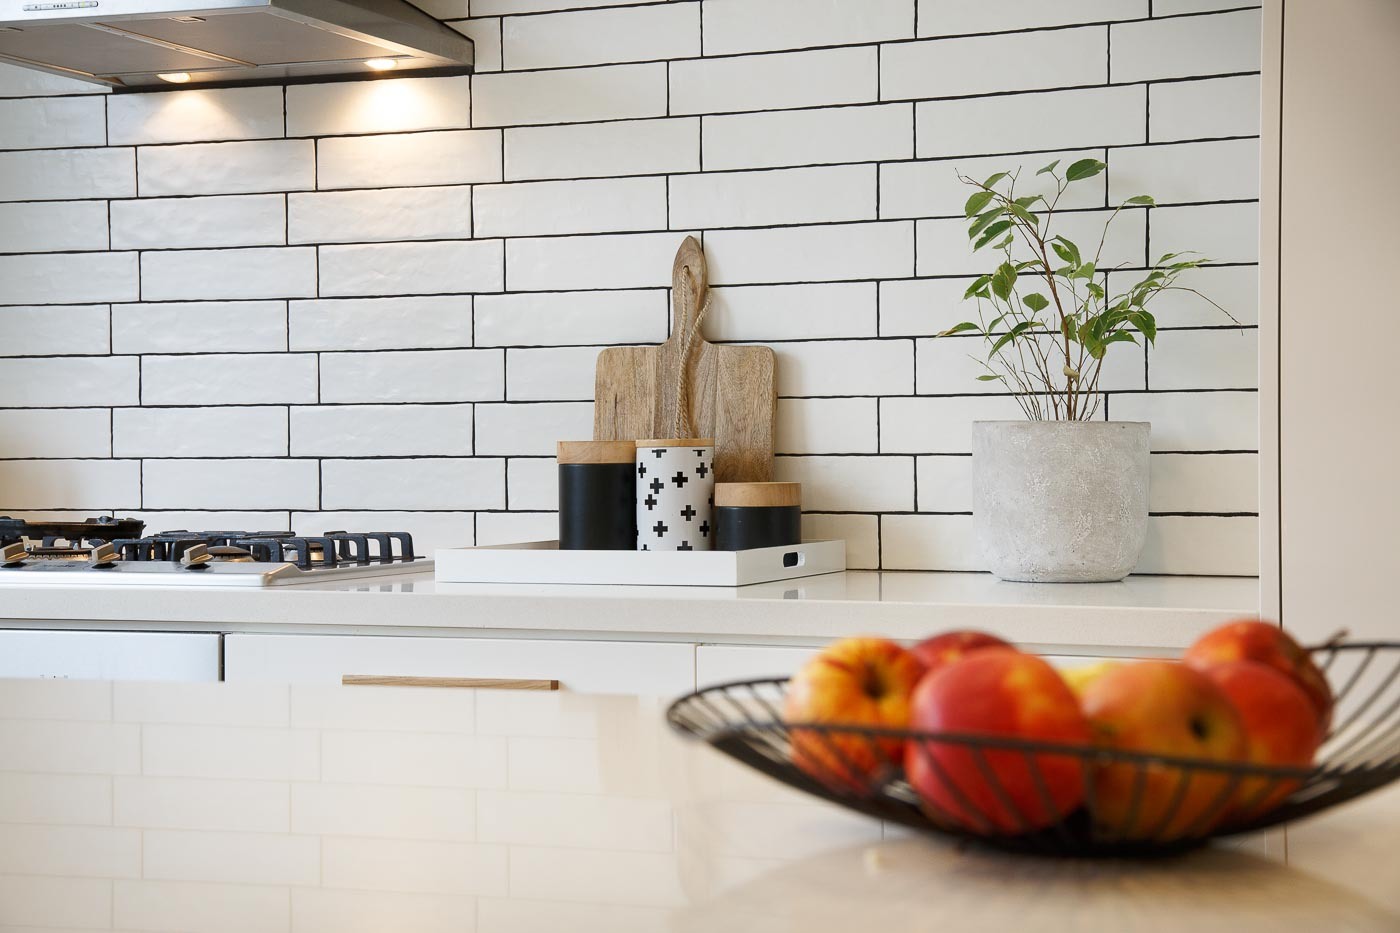 Keukens-stroo-berlare-werkblad-composiet